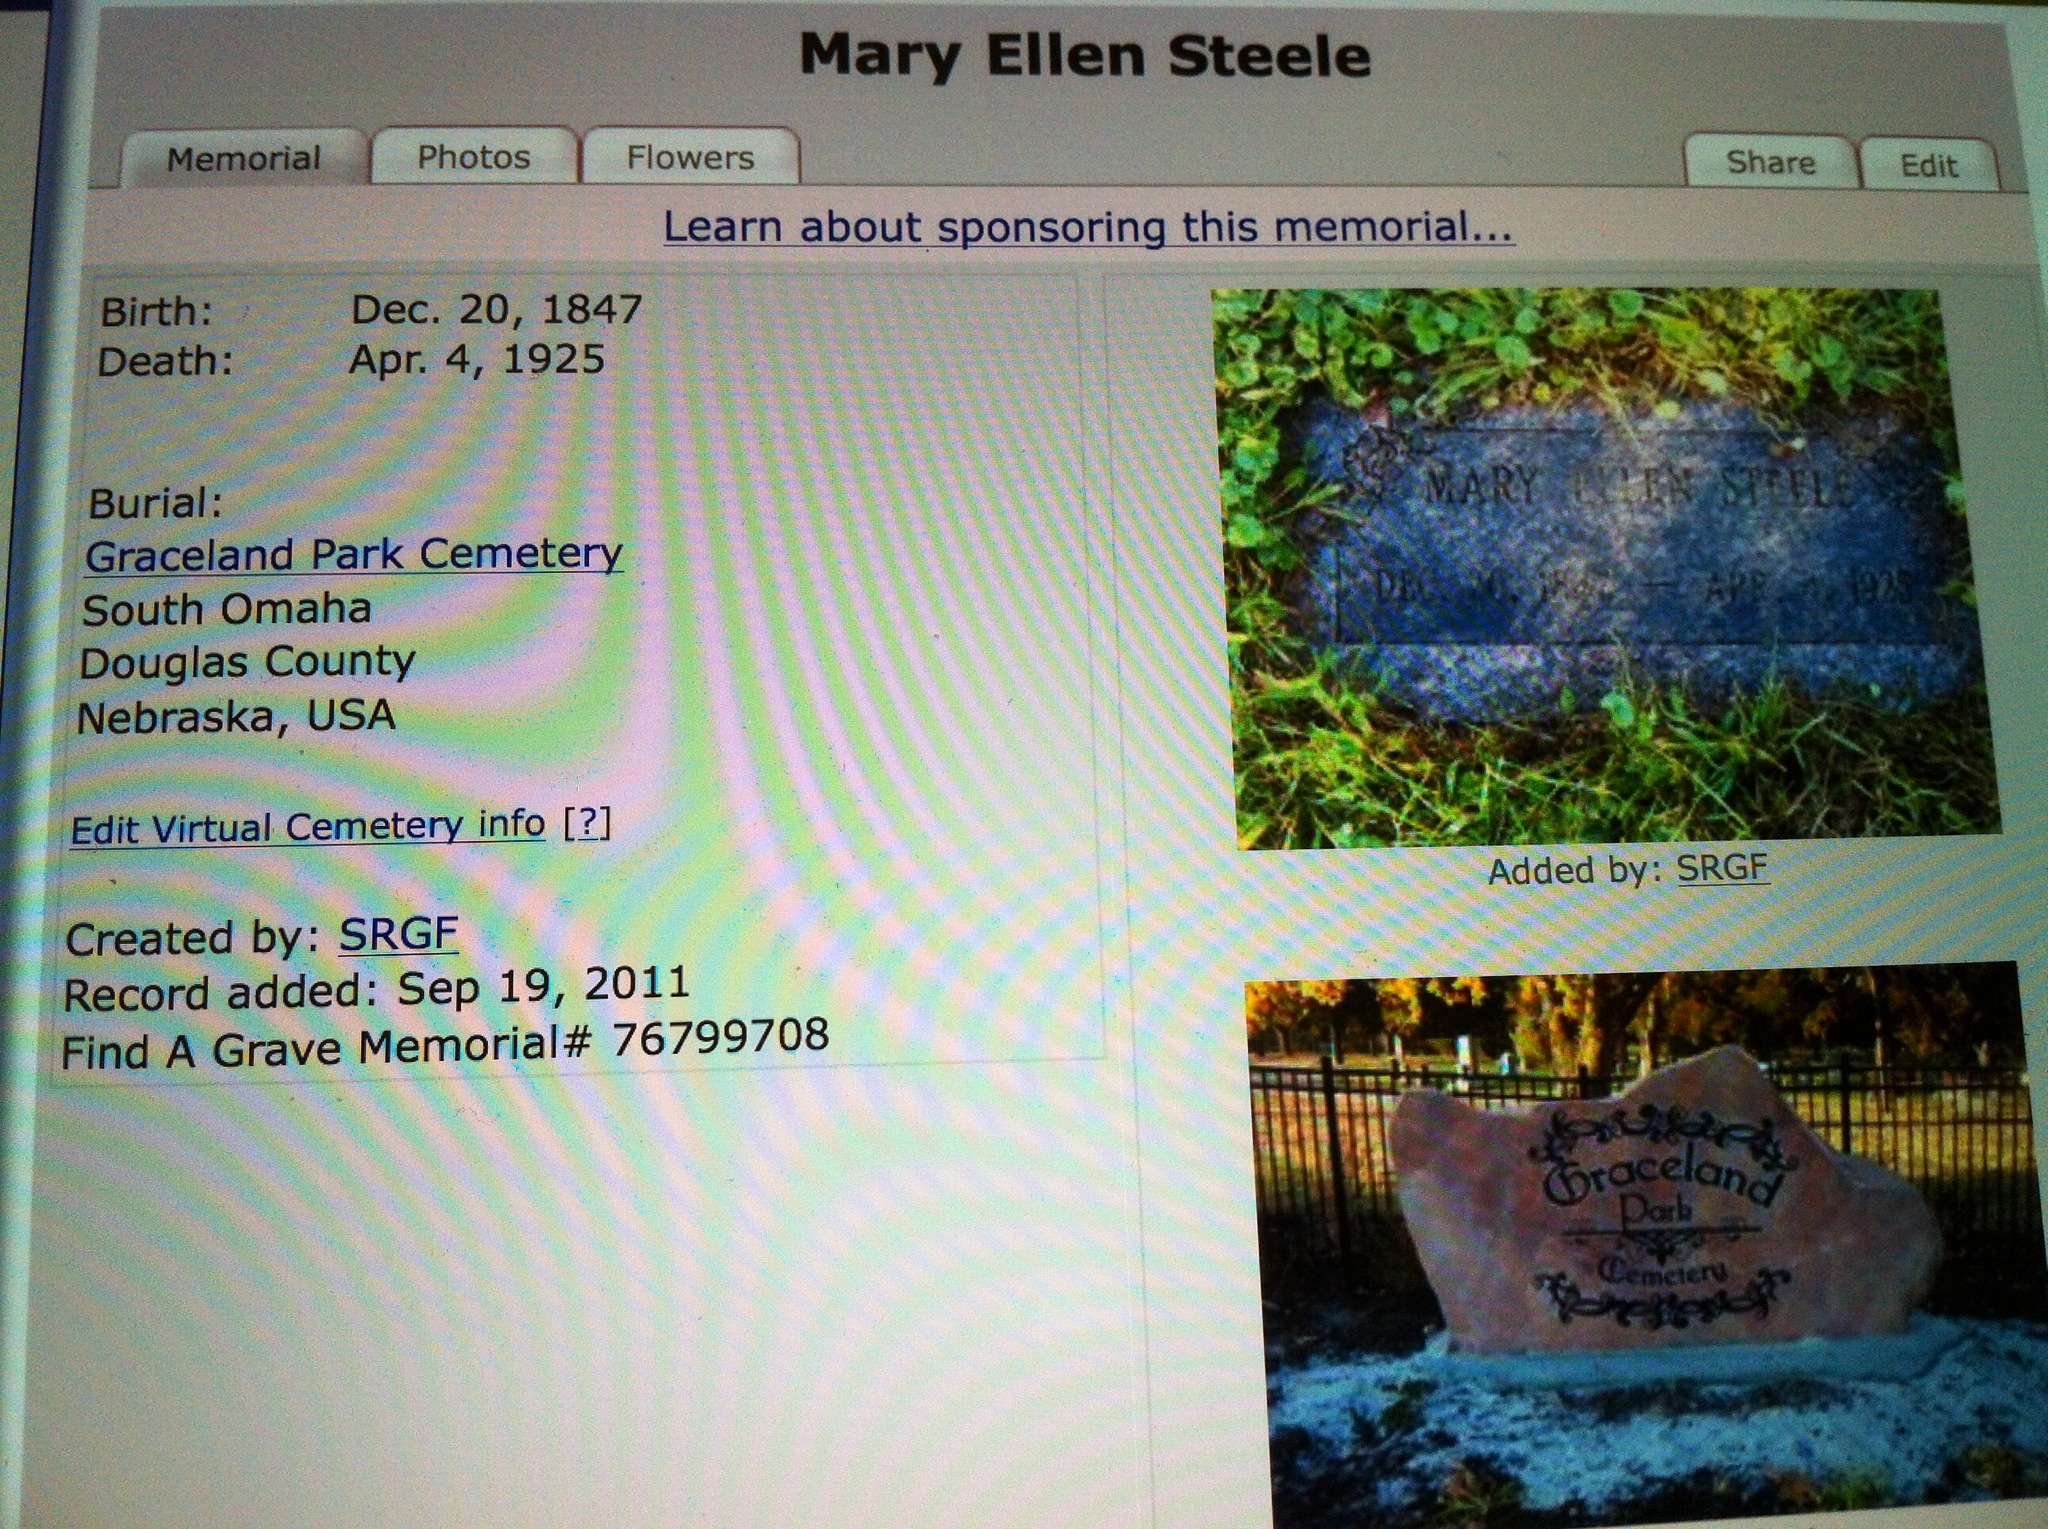 Mary Jane Mail